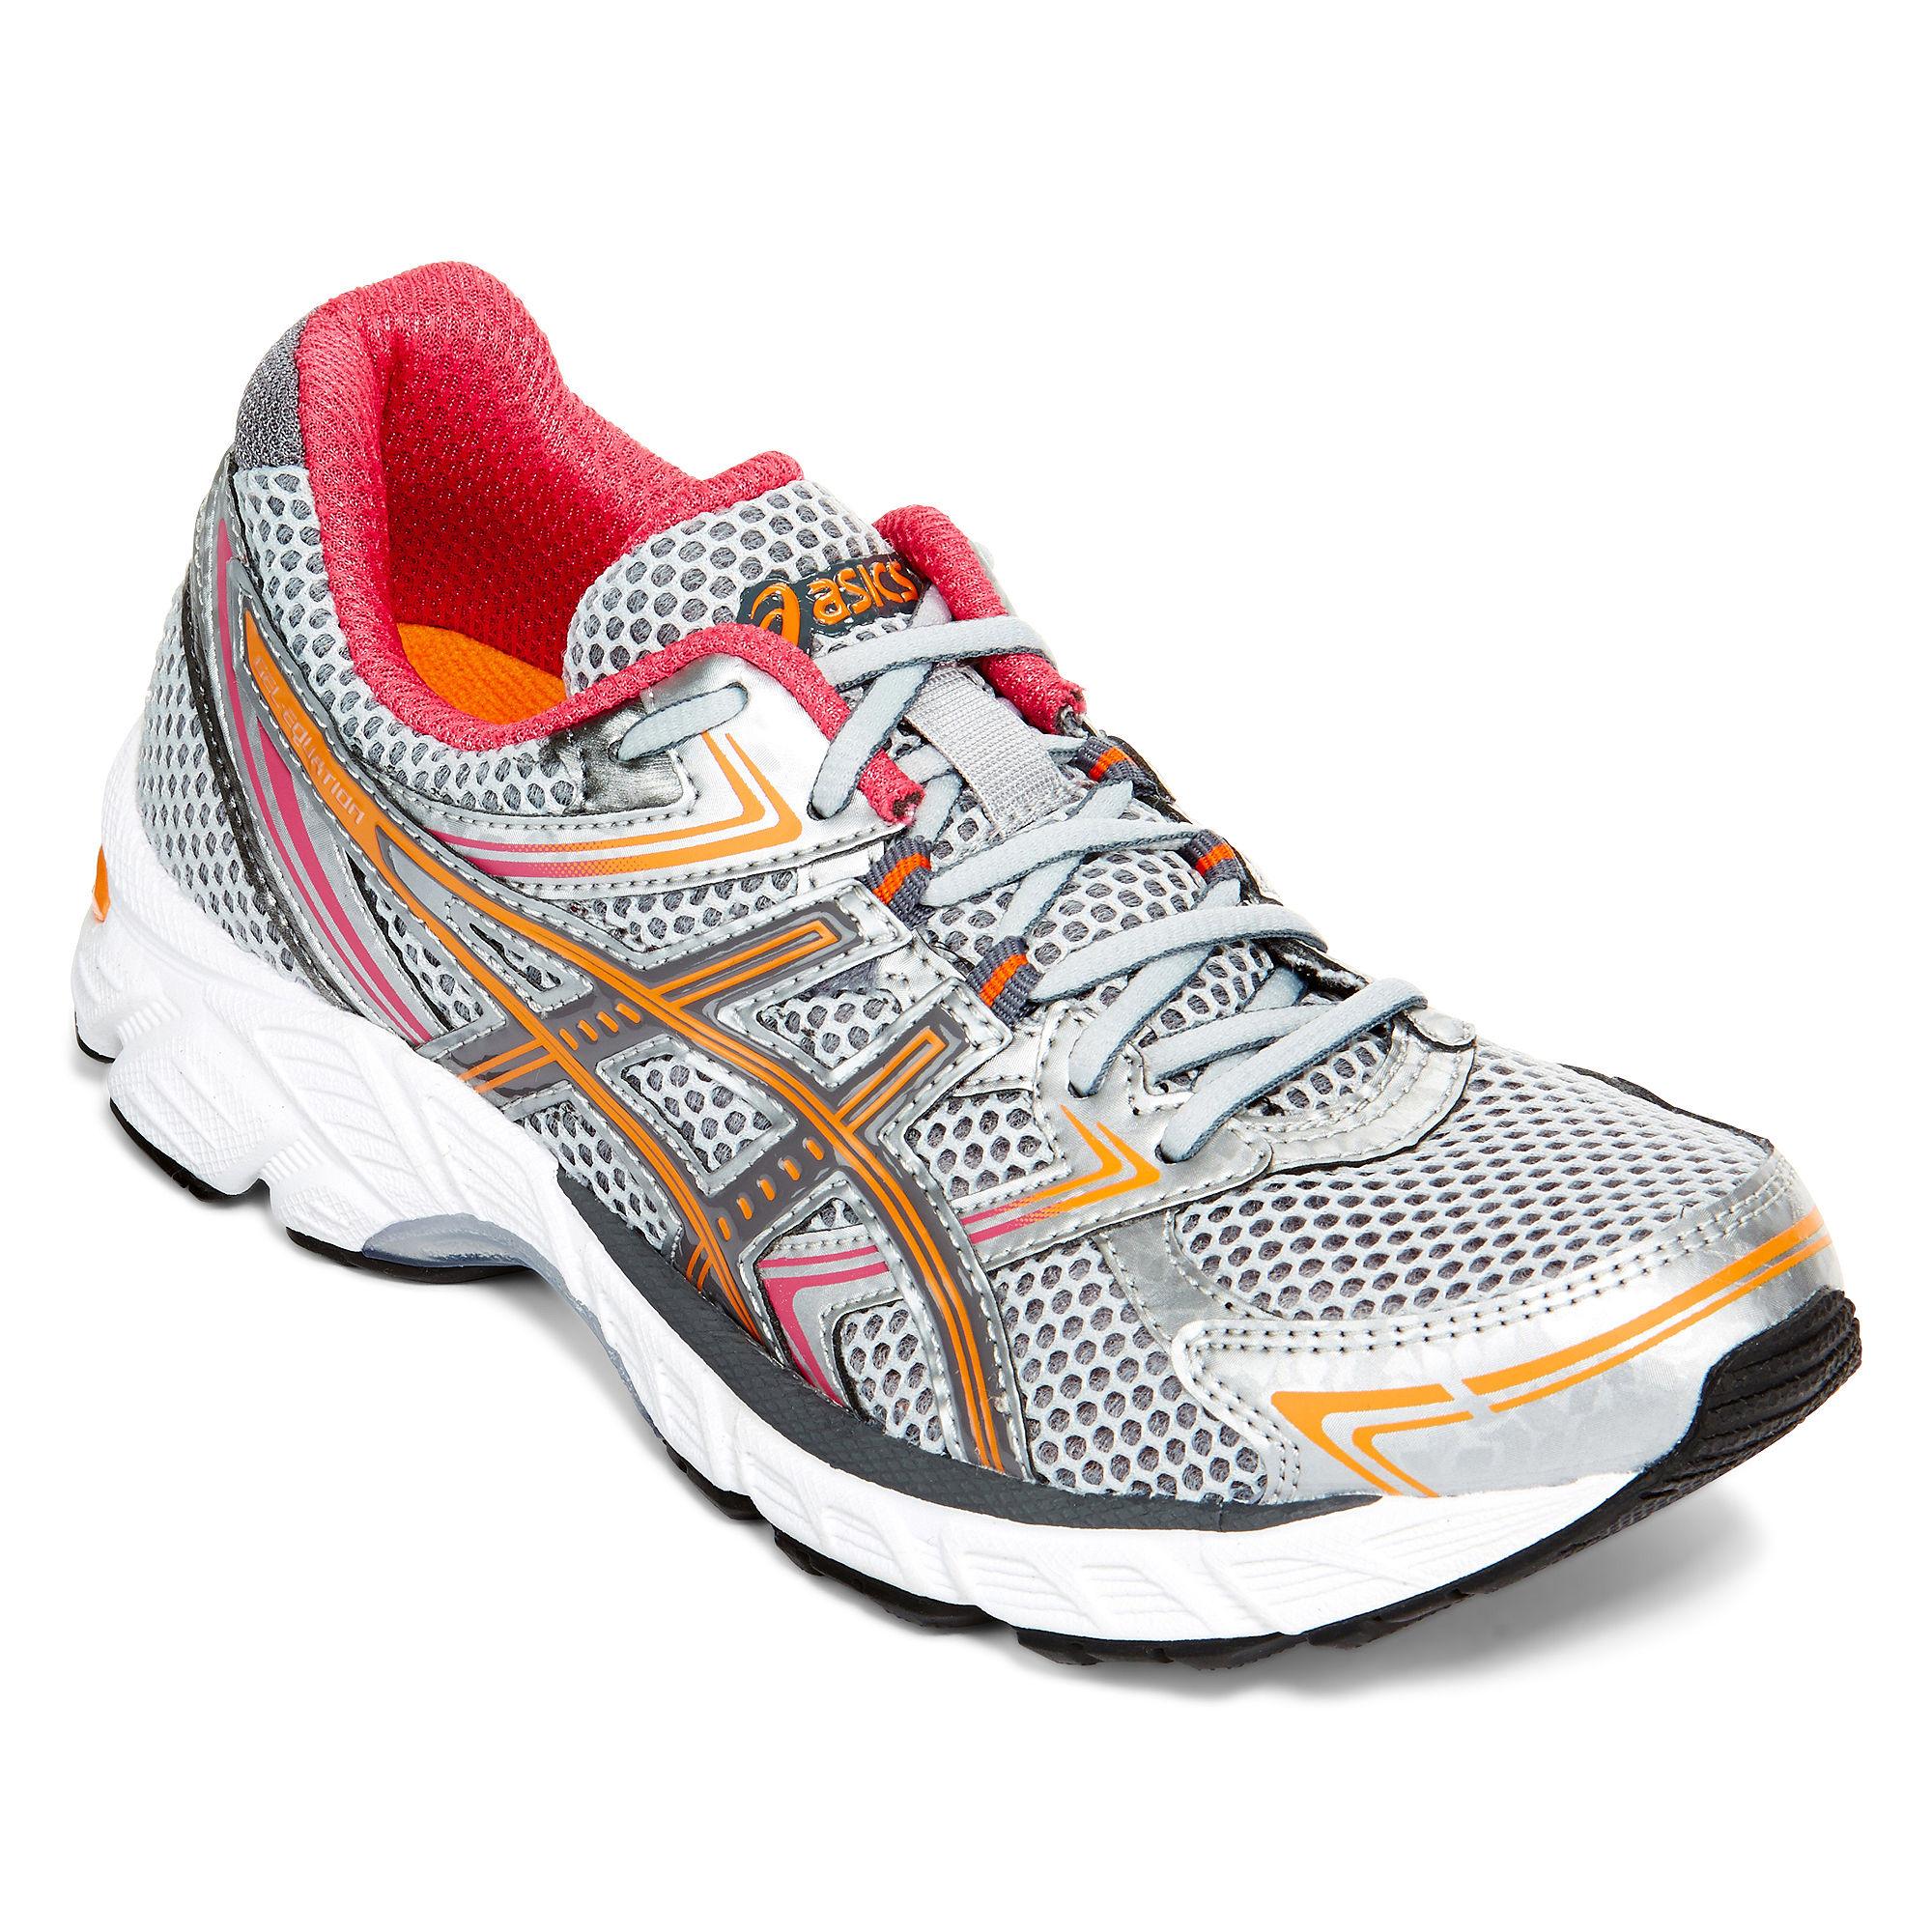 ASICS GEL-Equation 7 Womens Running Shoes